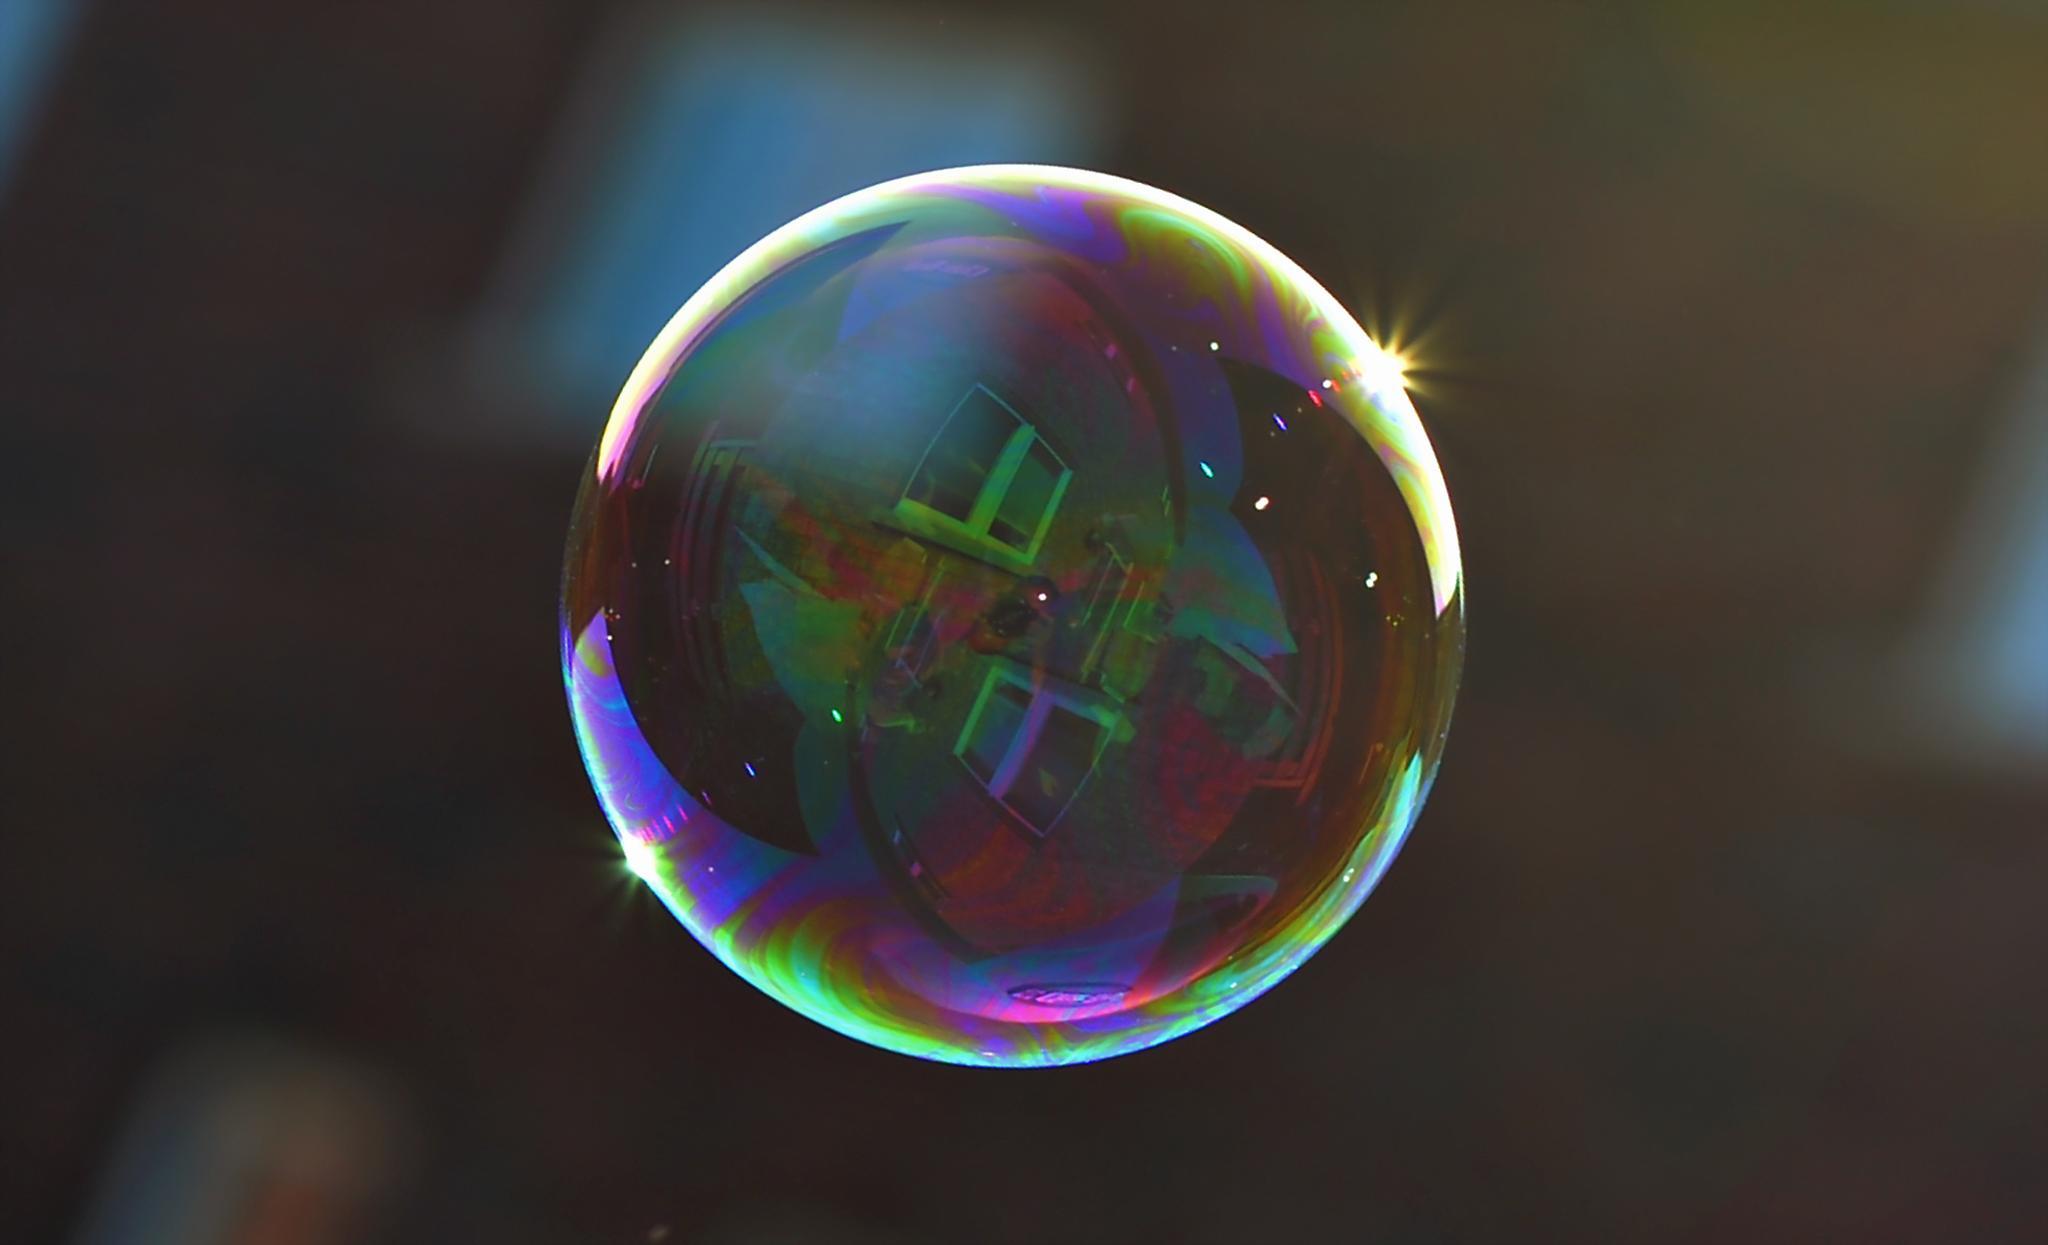 Bubble by DL